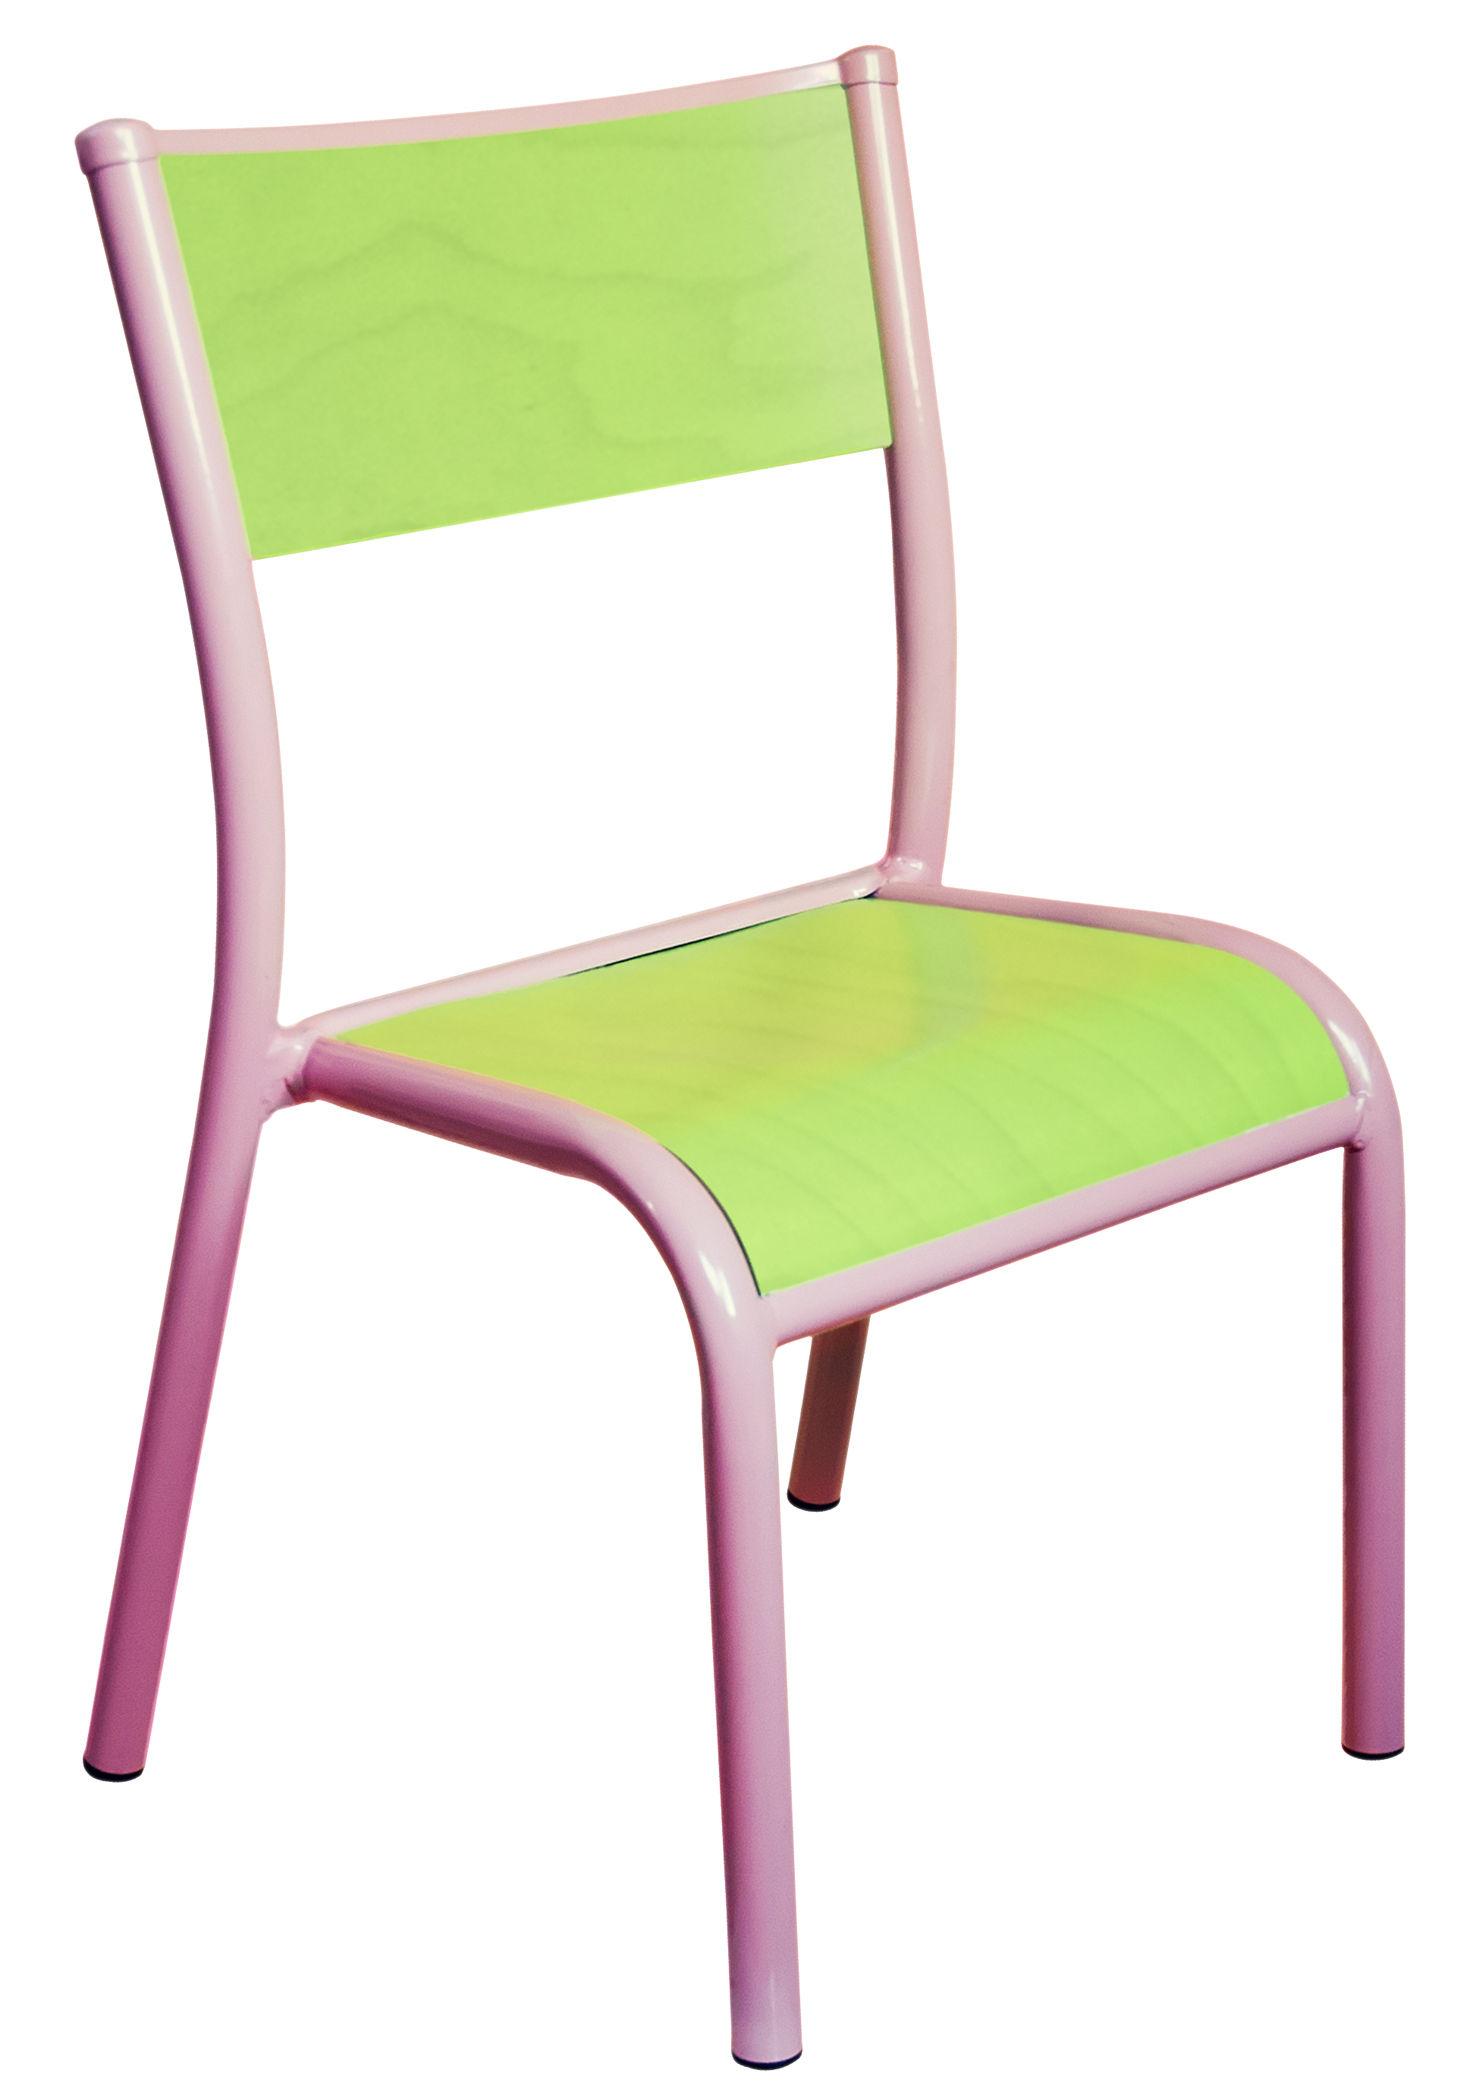 chaise enfant 510 originale r dition 1947 vert anis structure rose anglais label edition. Black Bedroom Furniture Sets. Home Design Ideas